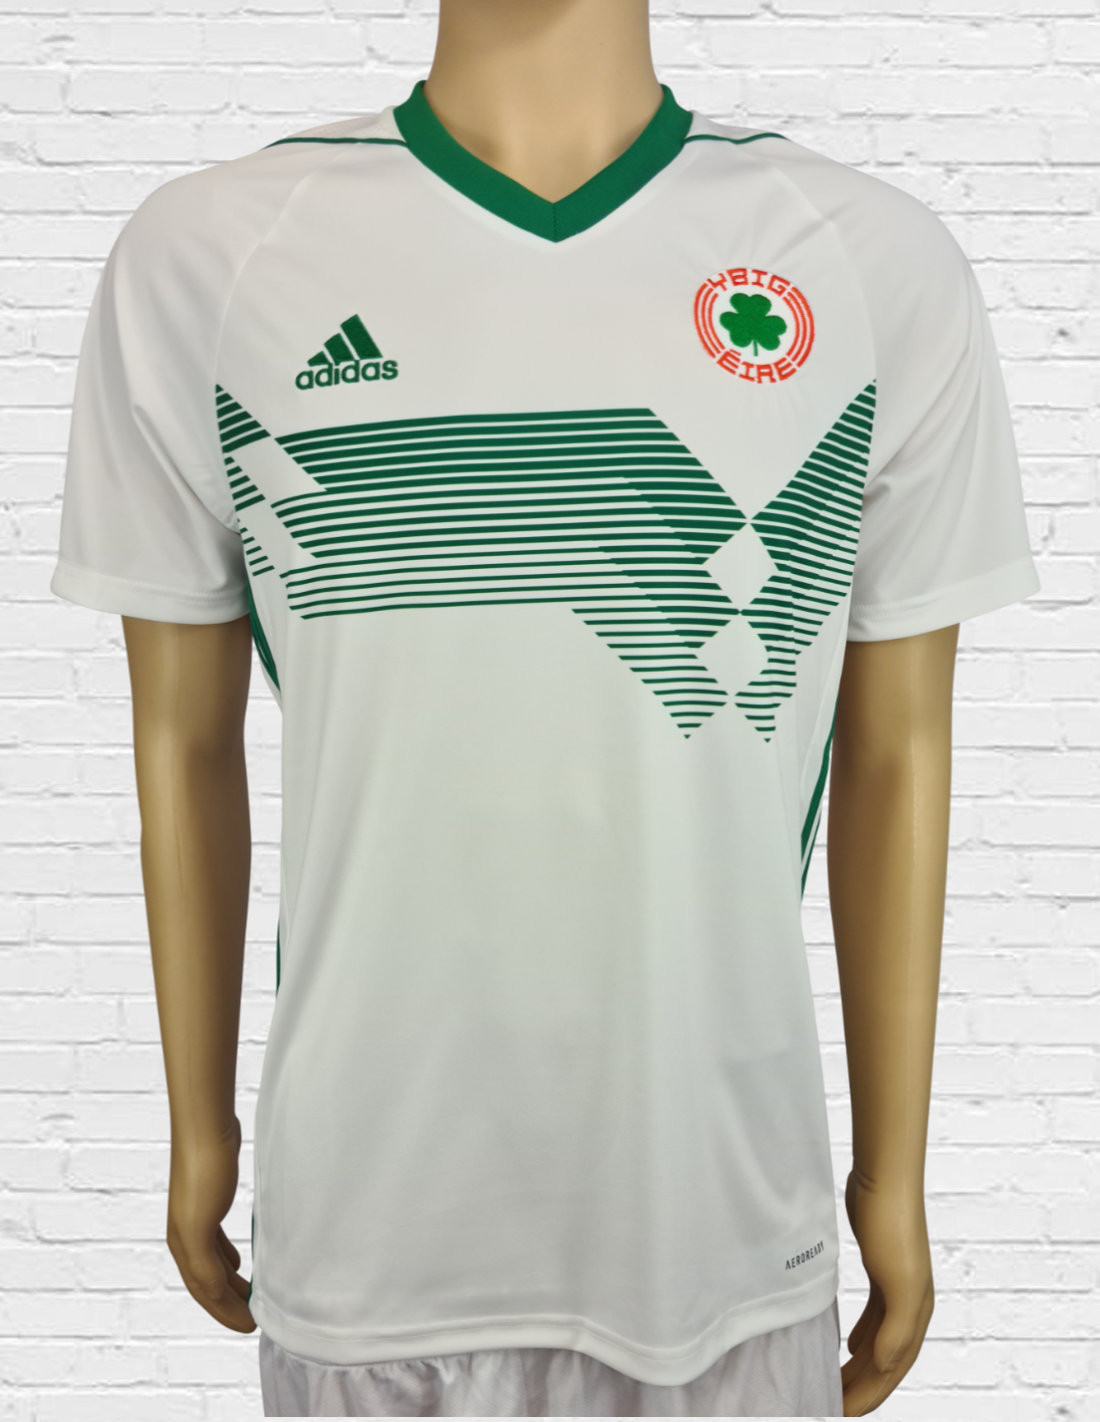 YBIG Adidas Ireland Jersey Mens | Away | ybigstore.com